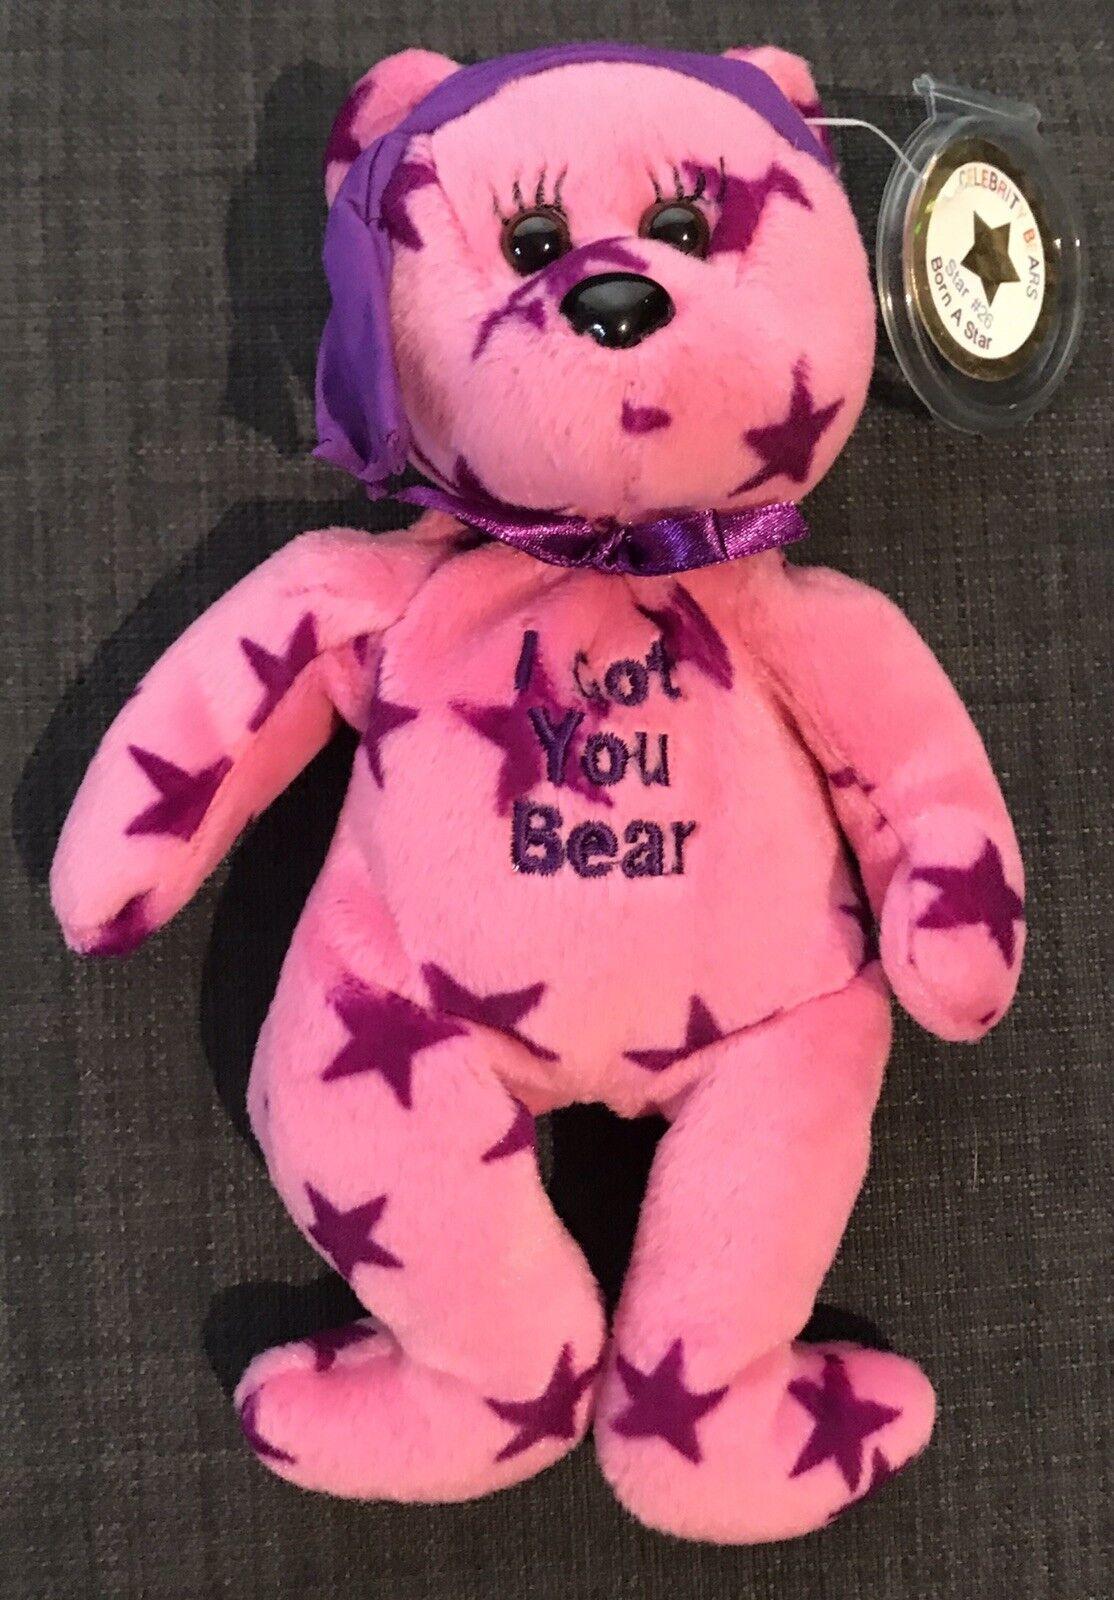 Cher I Got You Bear Beanie Kids Celebrity Bear like new VERY RARE